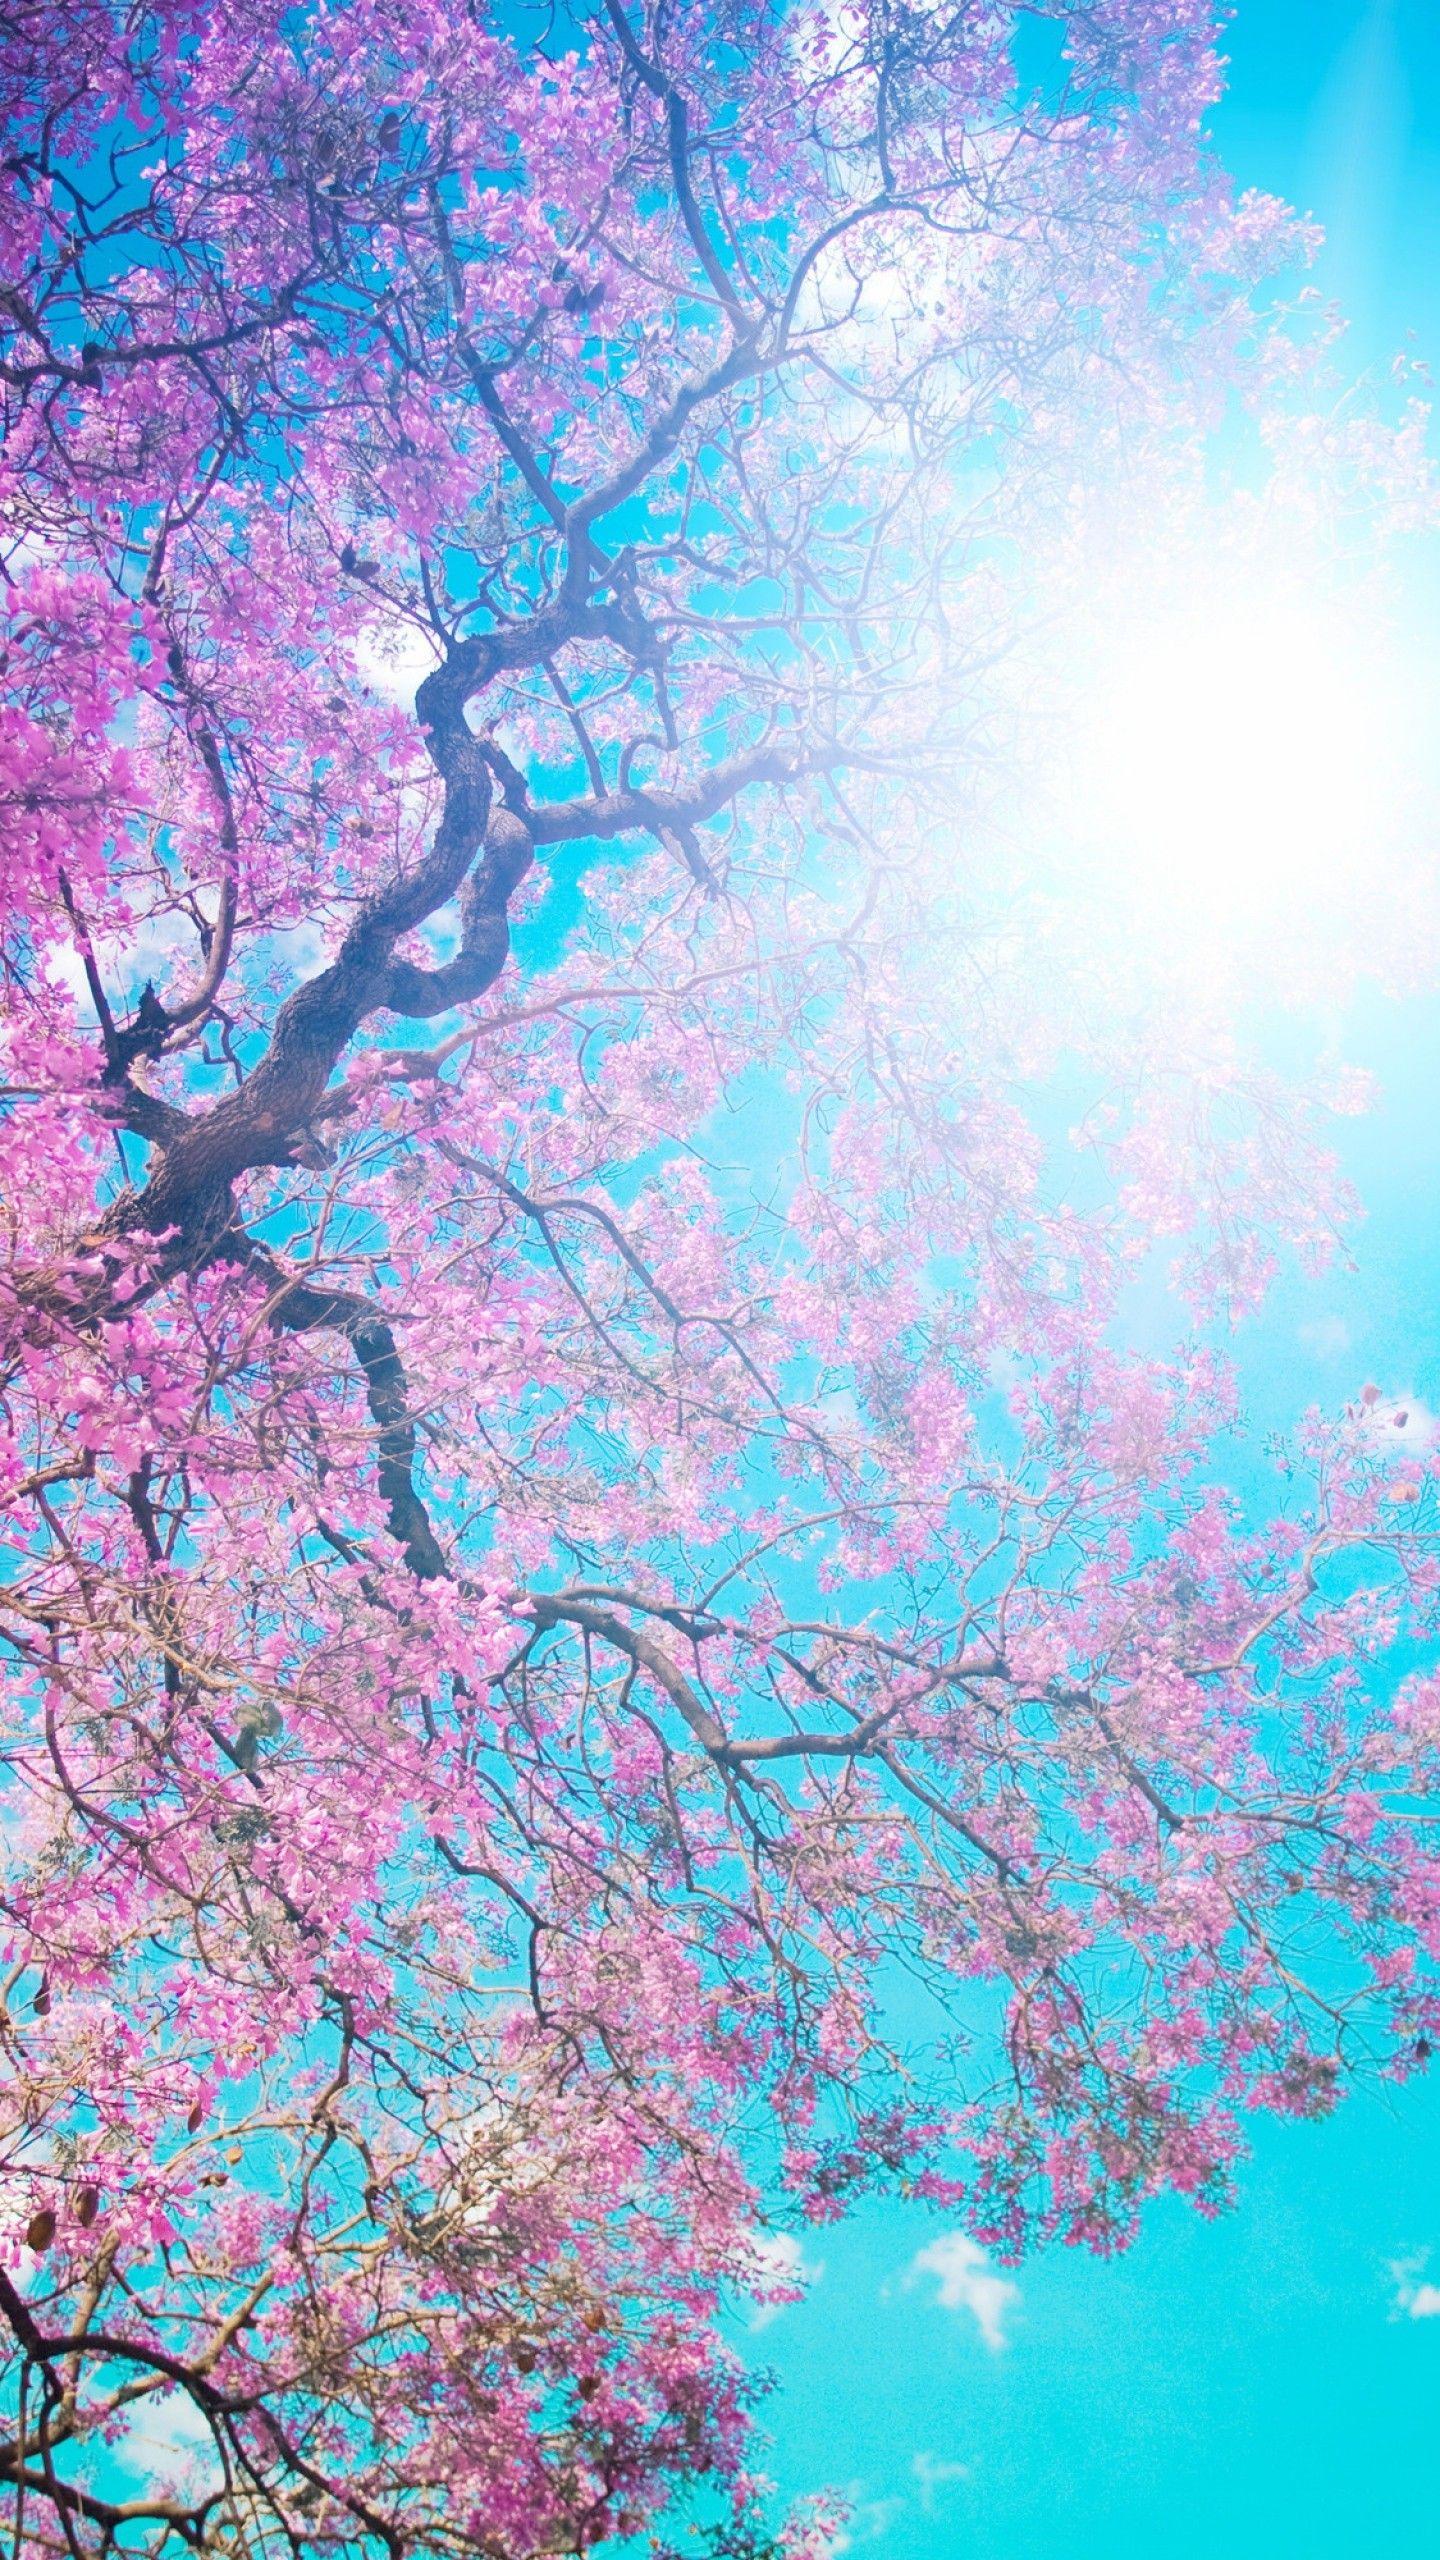 Cool Iphone 7 Top Wallpaper Hd 182 Spring Desktop Wallpaper Spring Wallpaper Nature Wallpaper